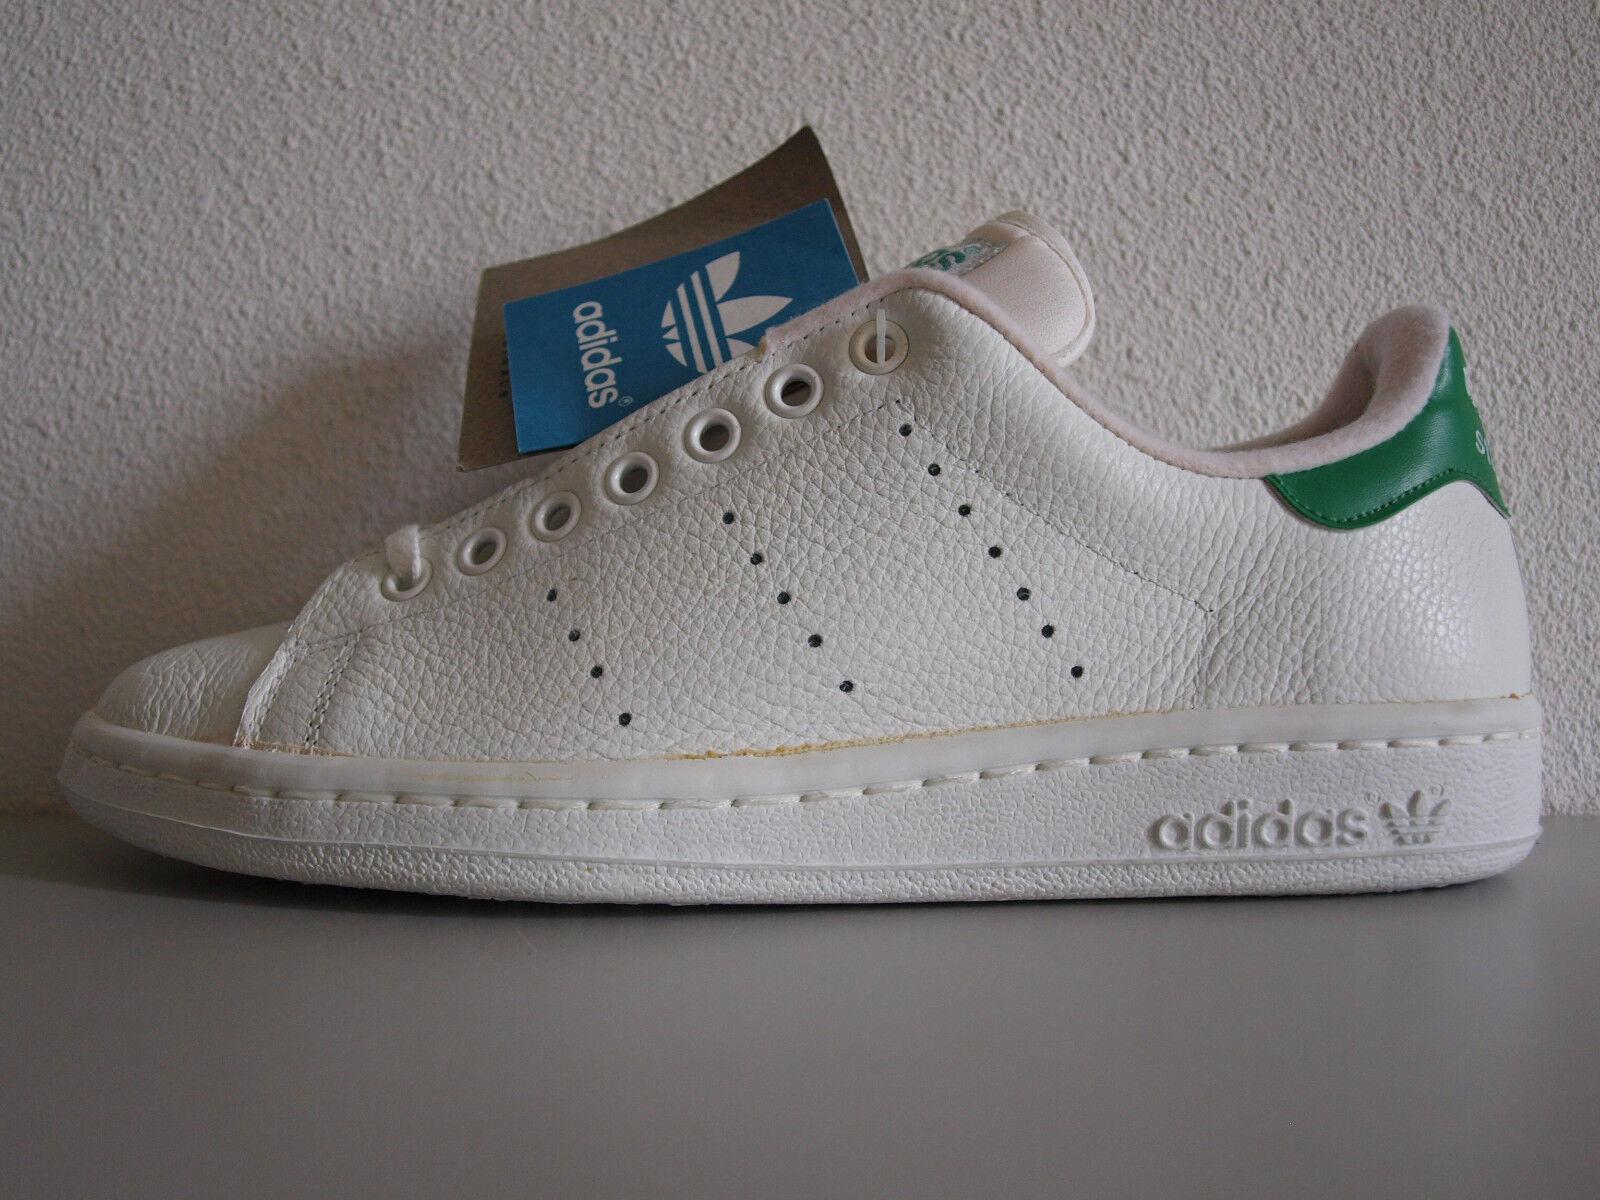 Adidas seltene stan smith uns 7 1991 jahrgang in spanien seltene Adidas originale bnib torsion og dd308e